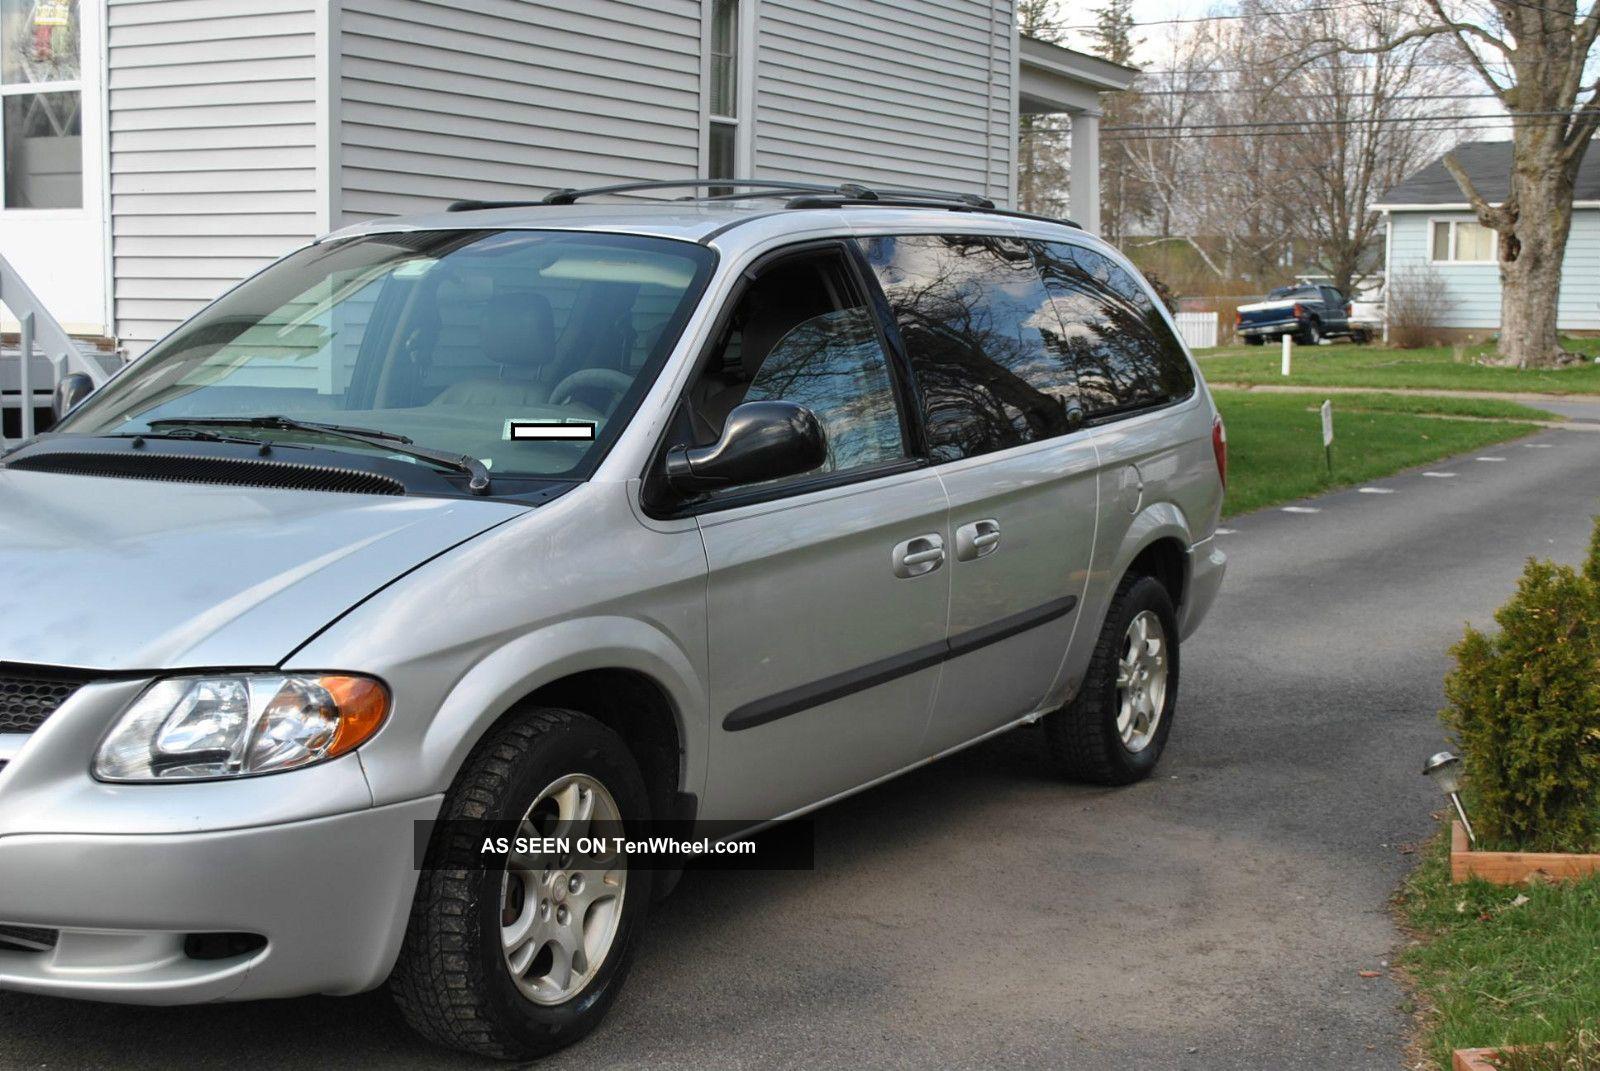 2003 dodge grand caravan ex mini passenger van 4 door 3 8l grand. Cars Review. Best American Auto & Cars Review